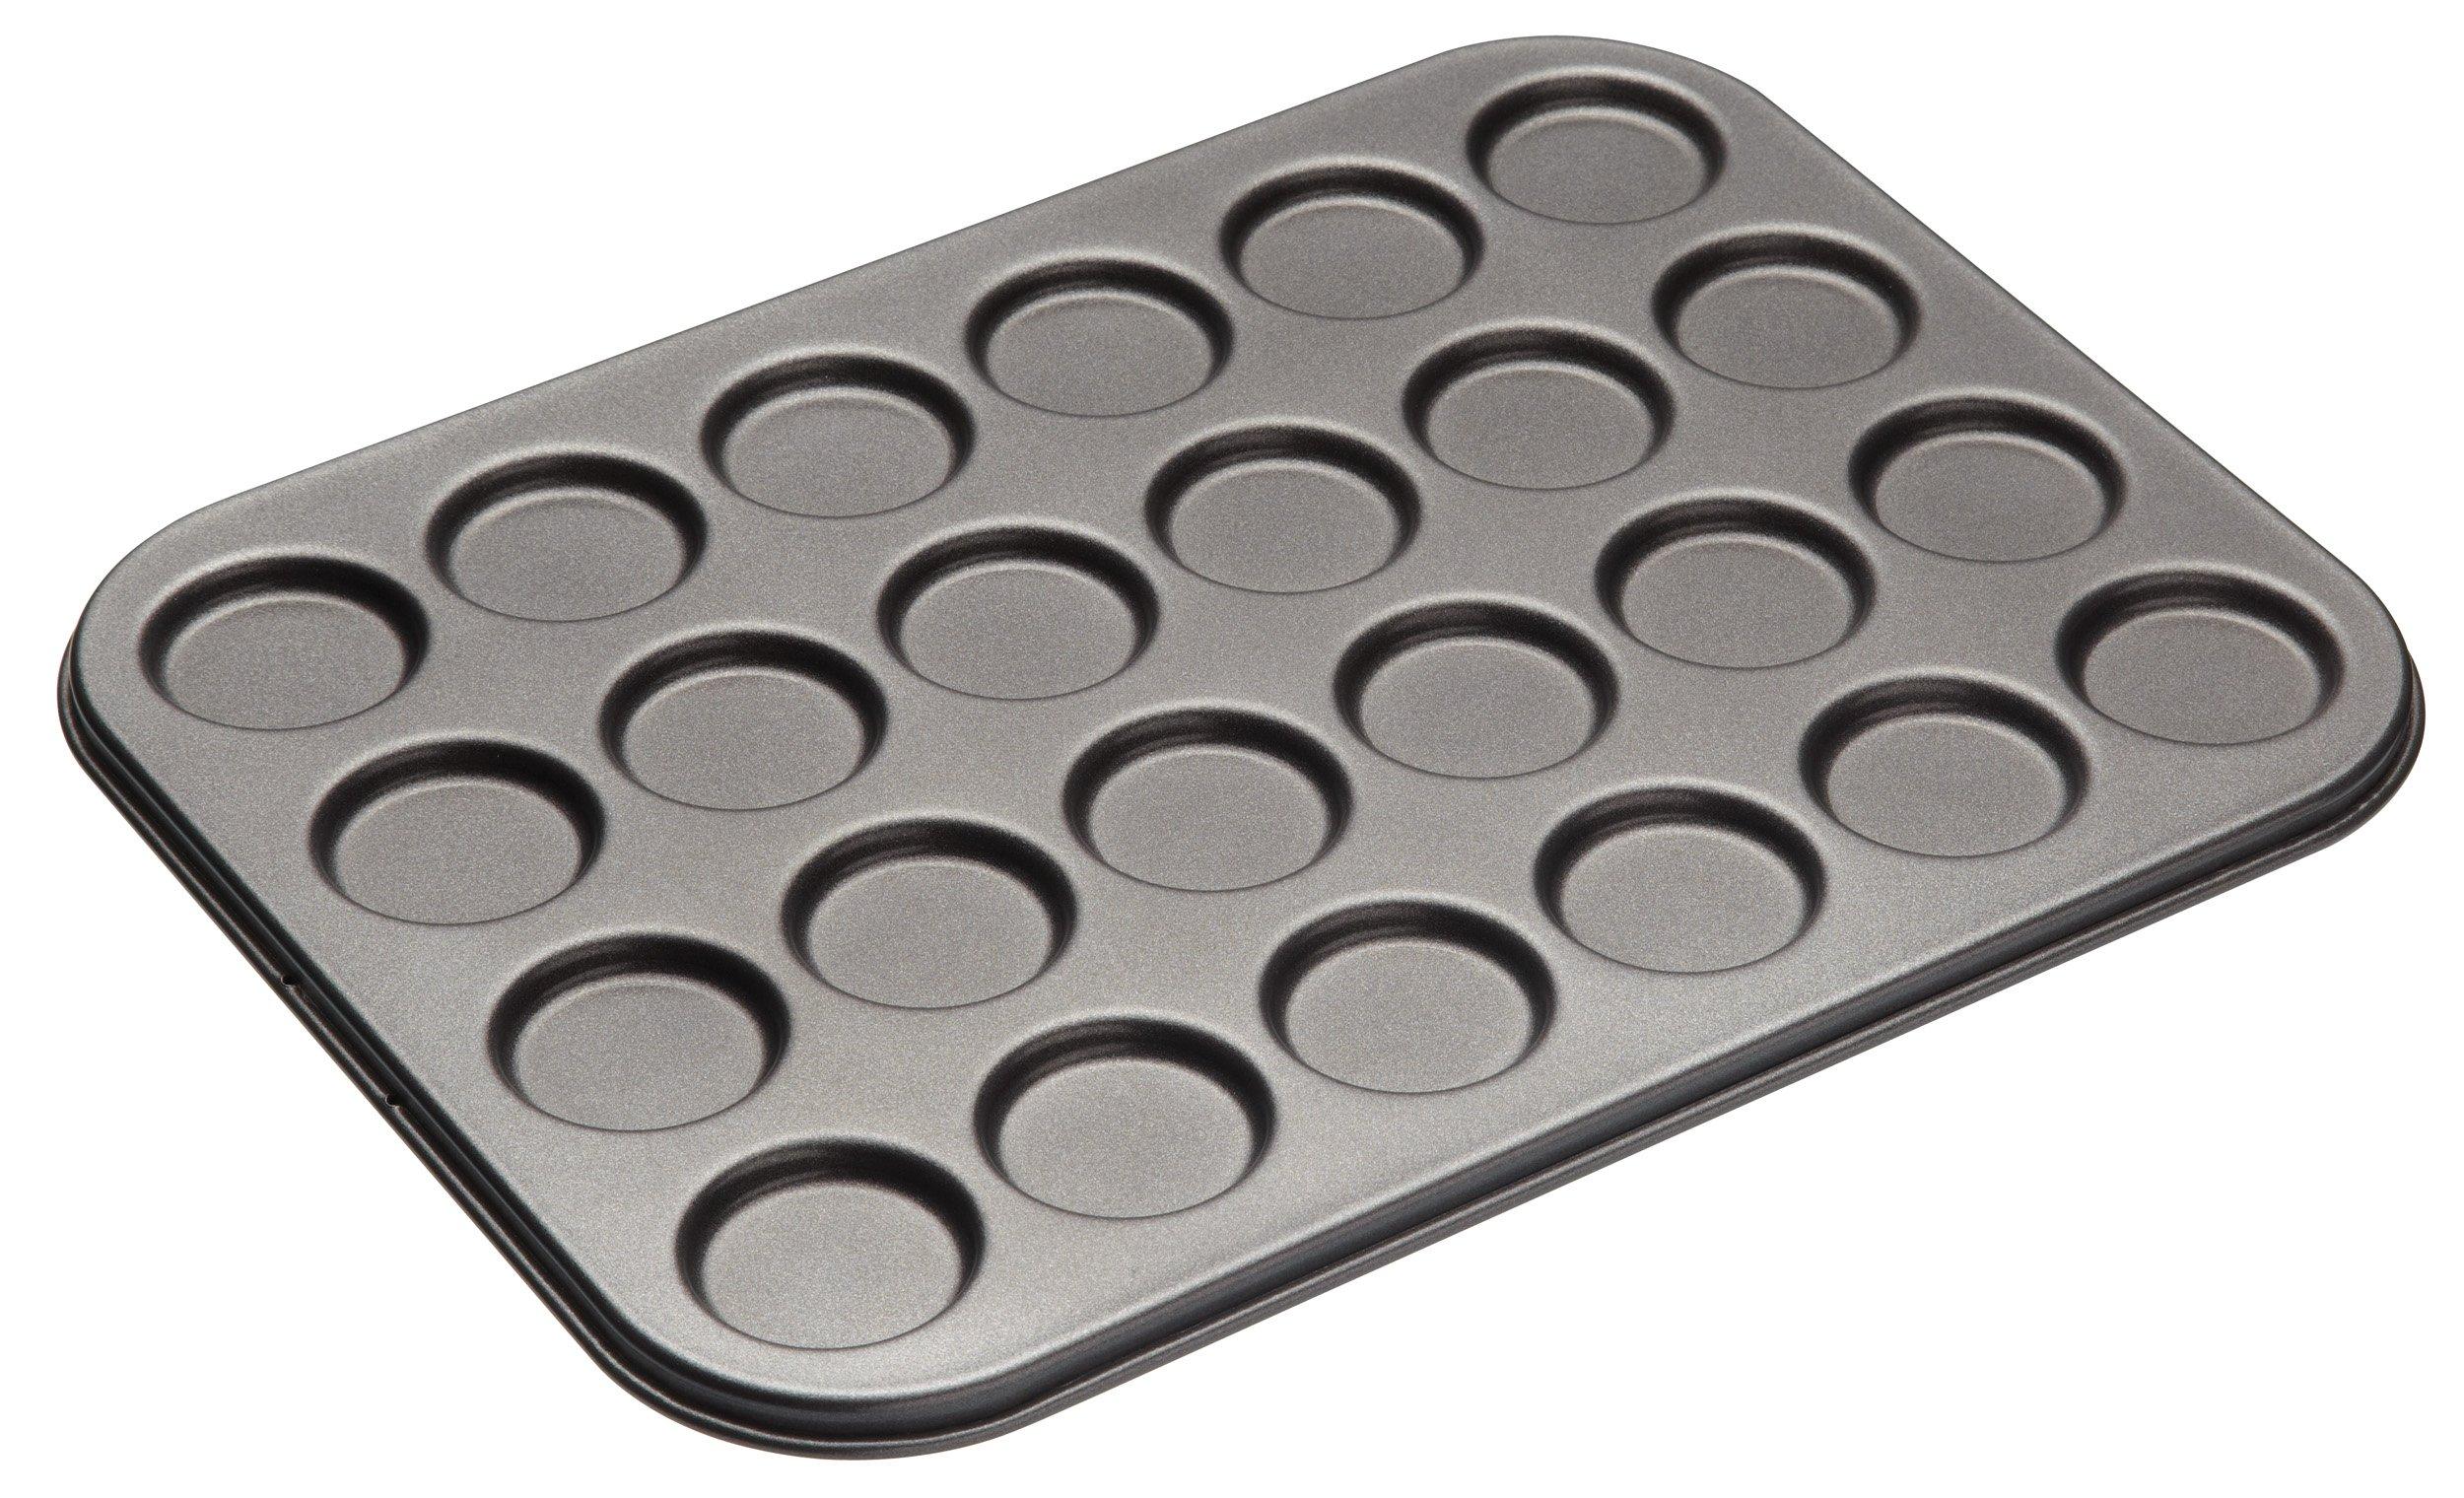 MasterClass Non Stick 24 Hole Whoopie Pie / Macaroon Pan, 13.75'' x 10.5''